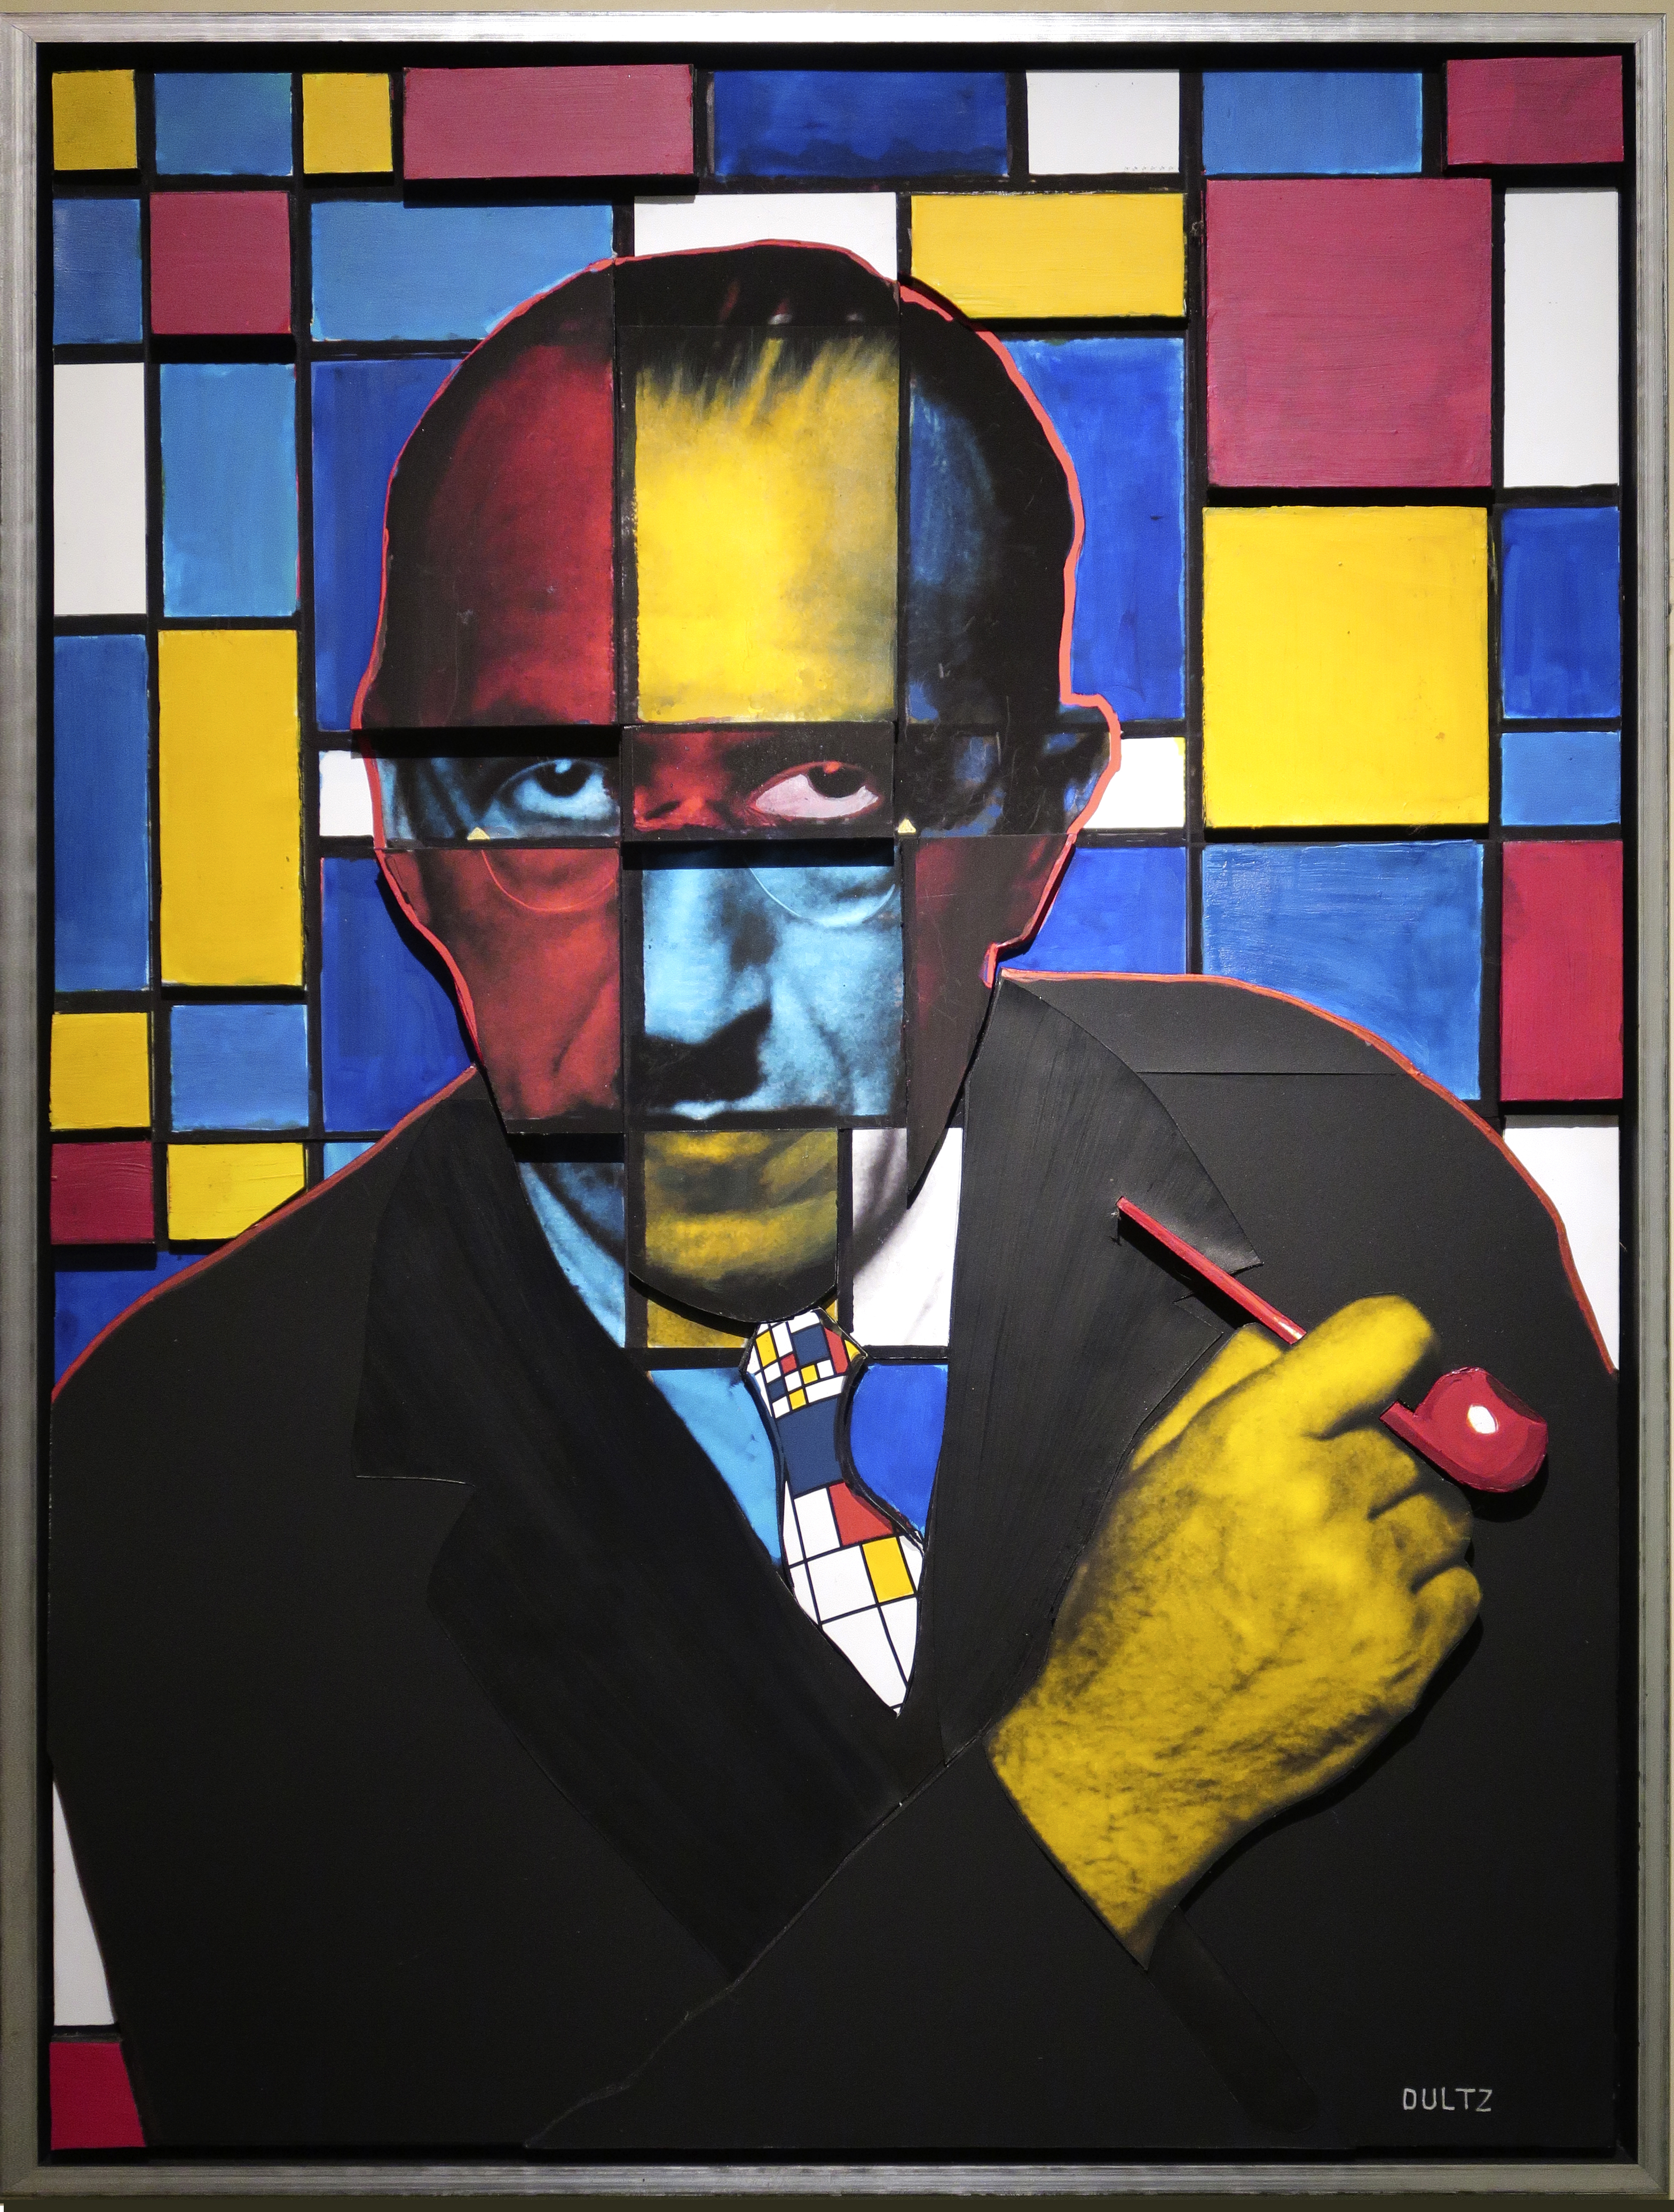 Building on Mondrian